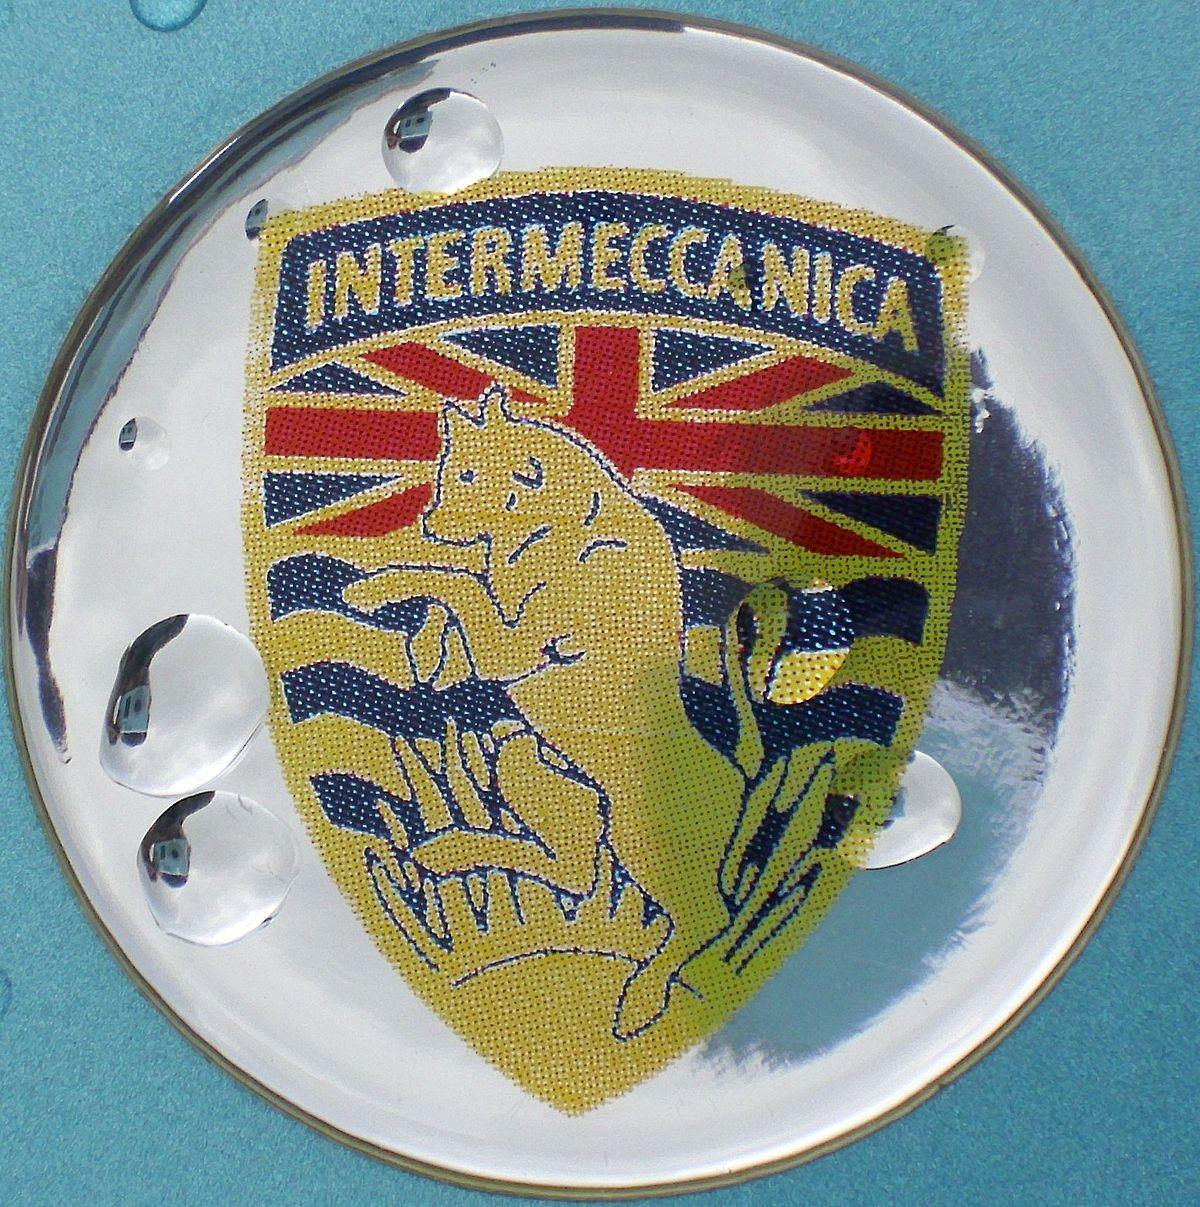 Intermeccanica Wikipedia Porsche 356a Wiring Diagram